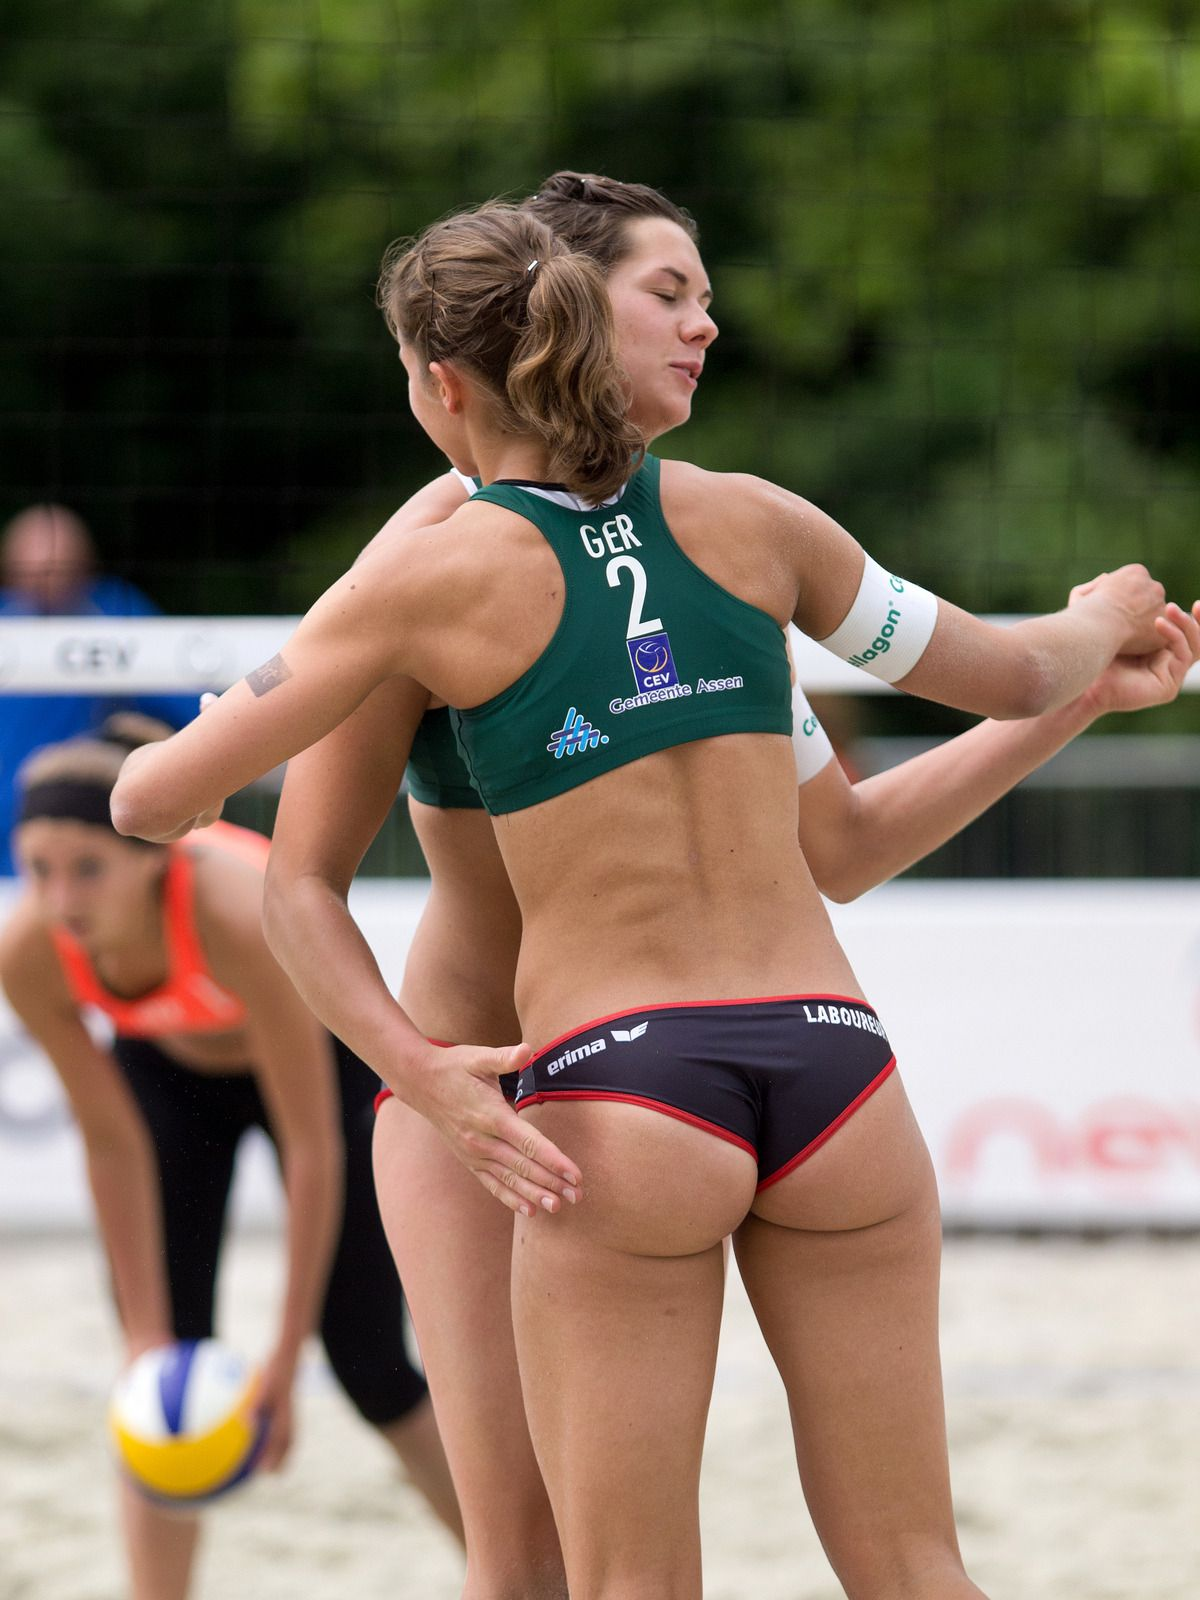 Topless boob junior olympics girls volleyball